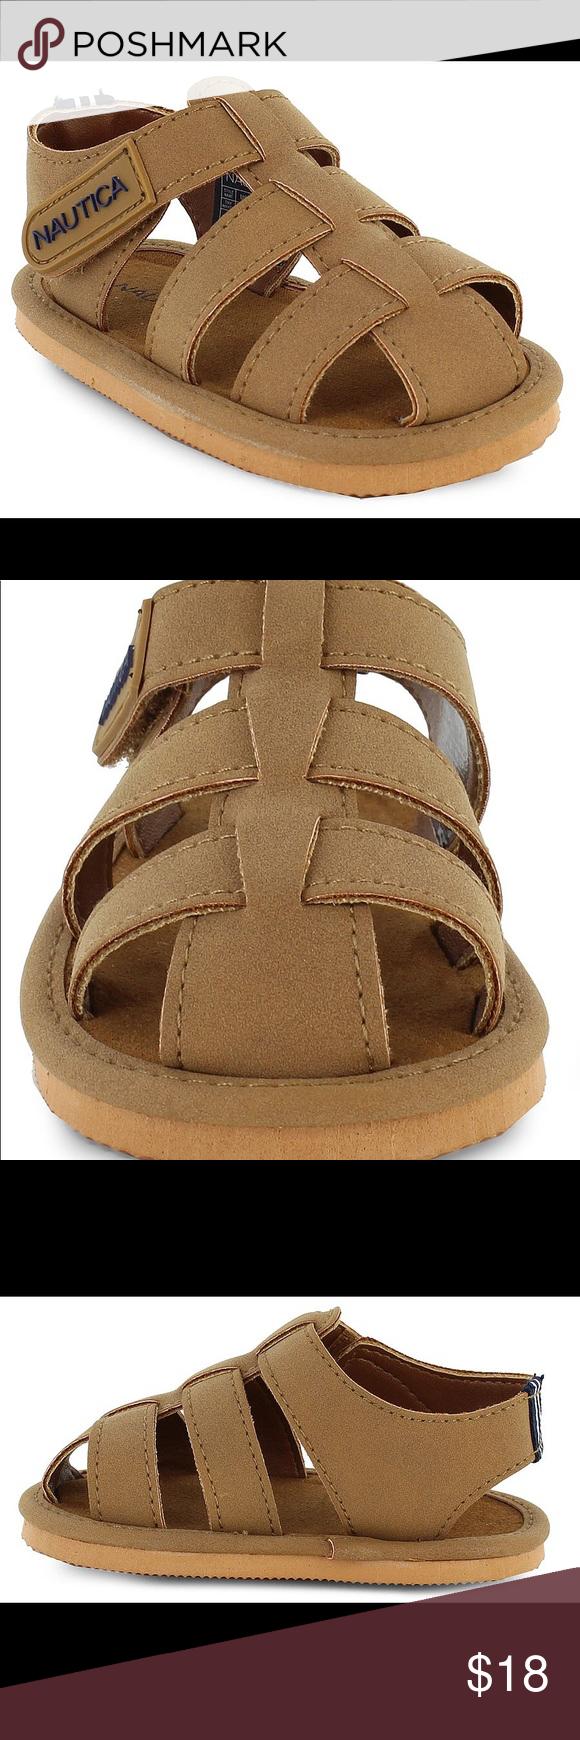 Sold Náutica baby sandals   Baby